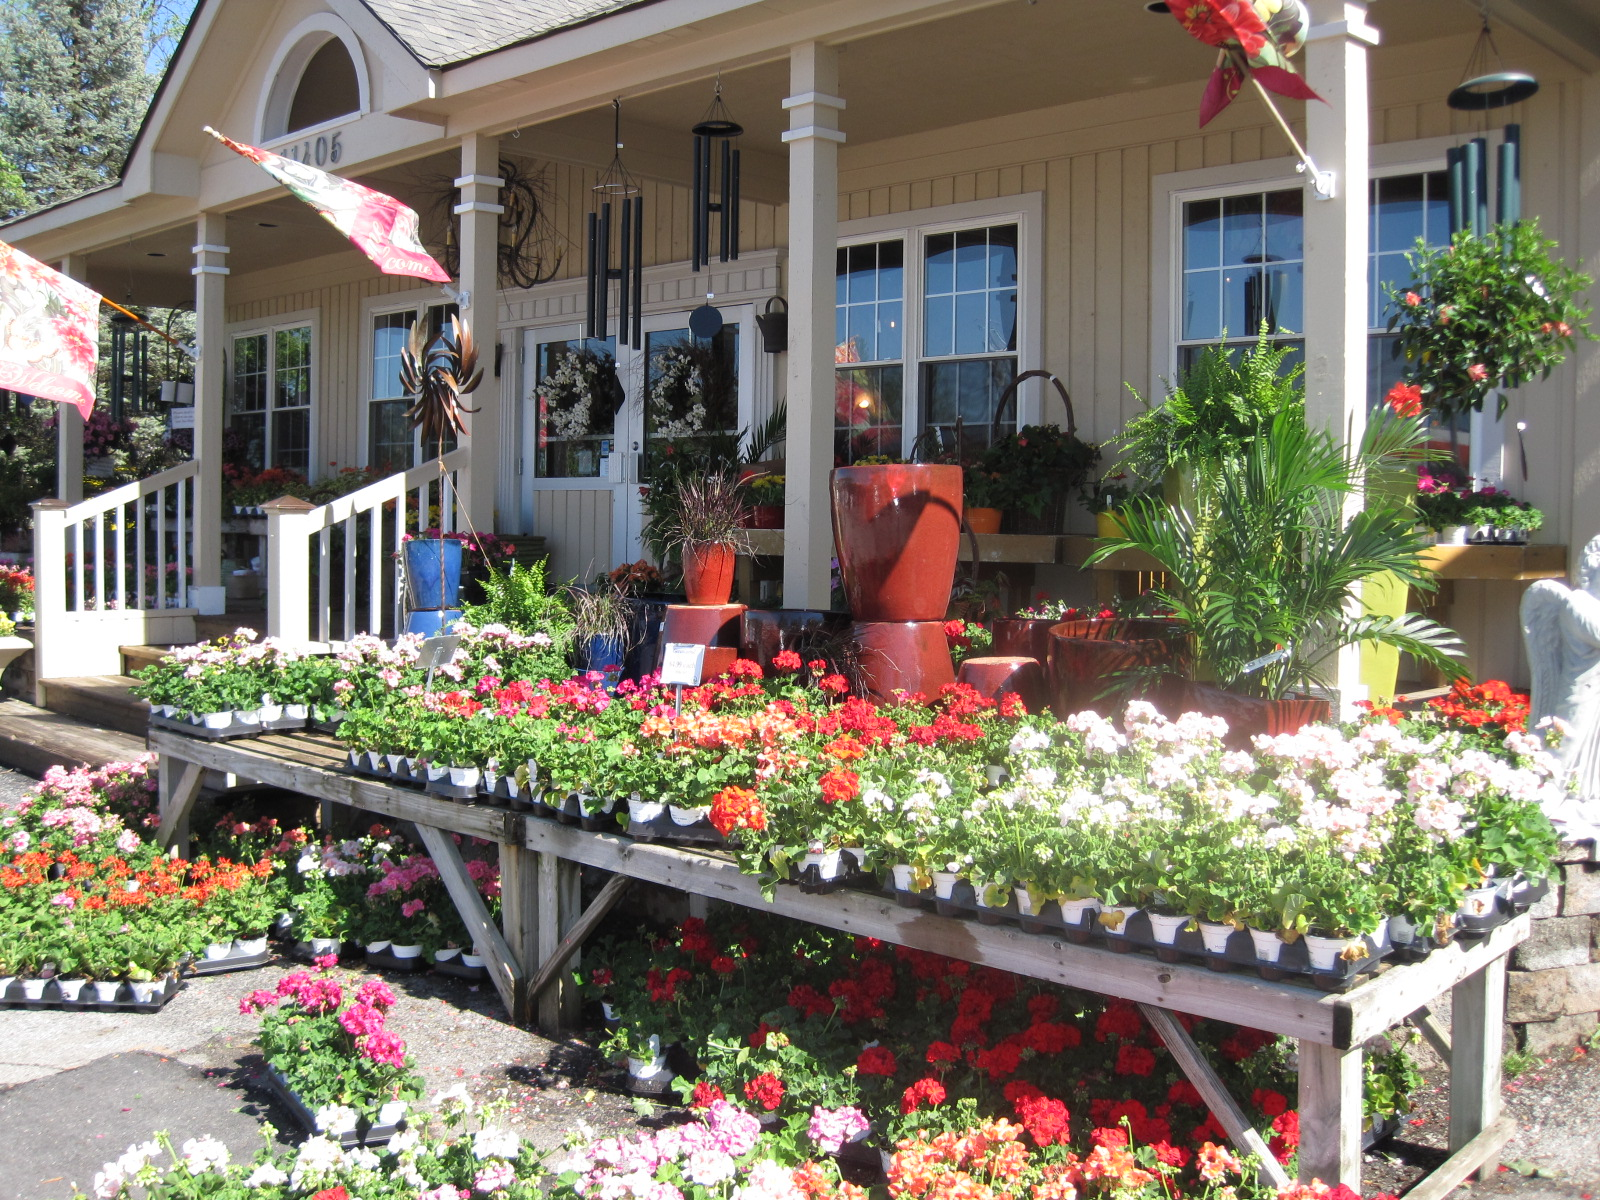 Allisonville Nursery, Garden U0026 Home